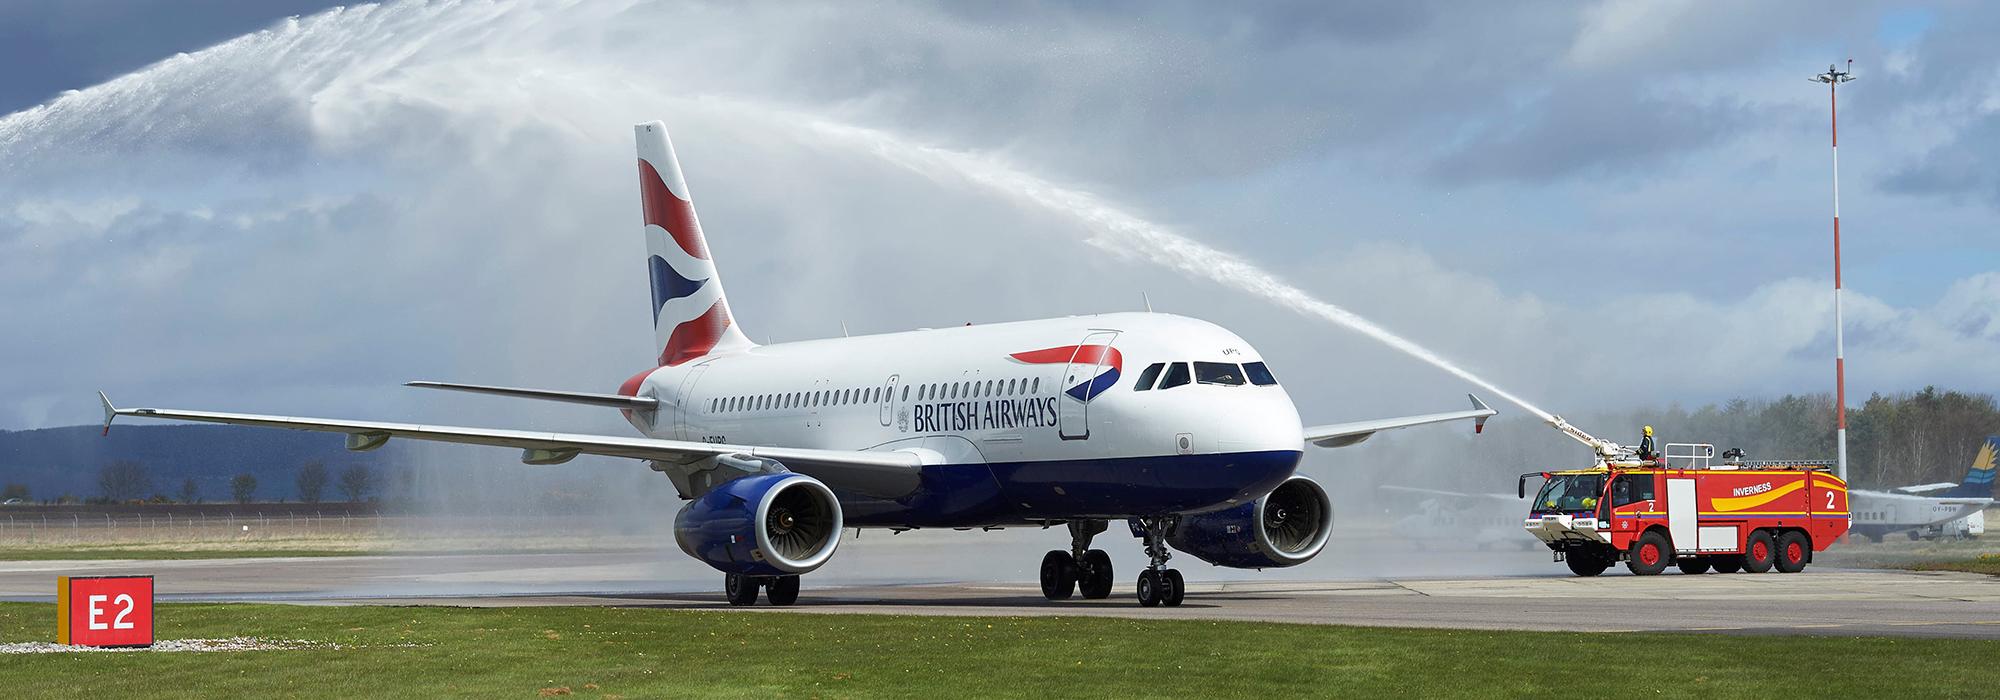 Heathrow BA first flight, Inverness Airport 3/5/16